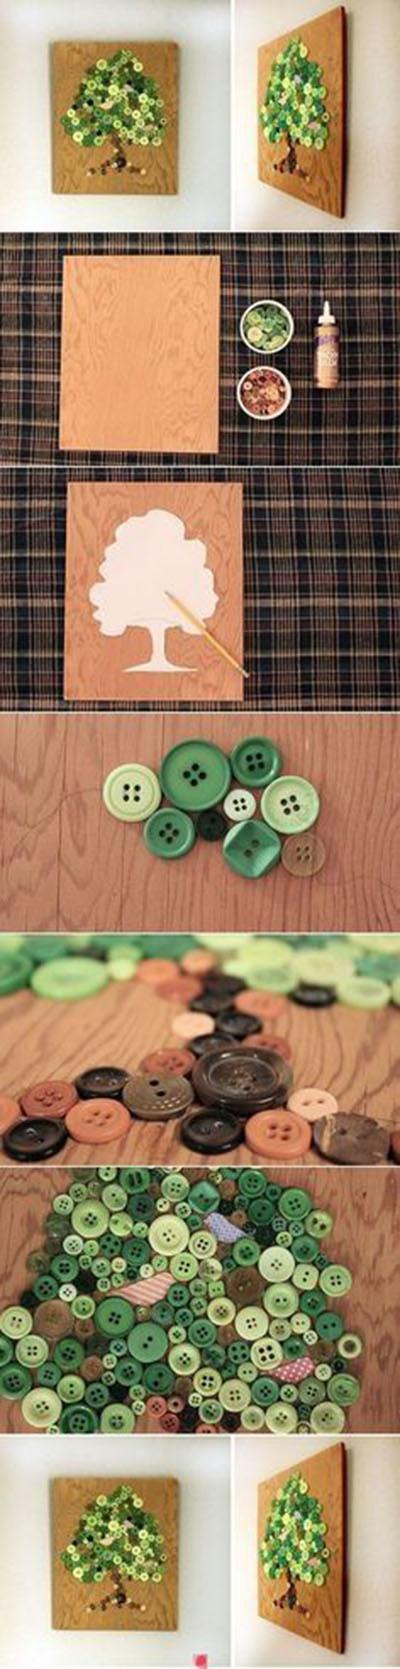 20 DIY Button Wall Art82a9d5c9e